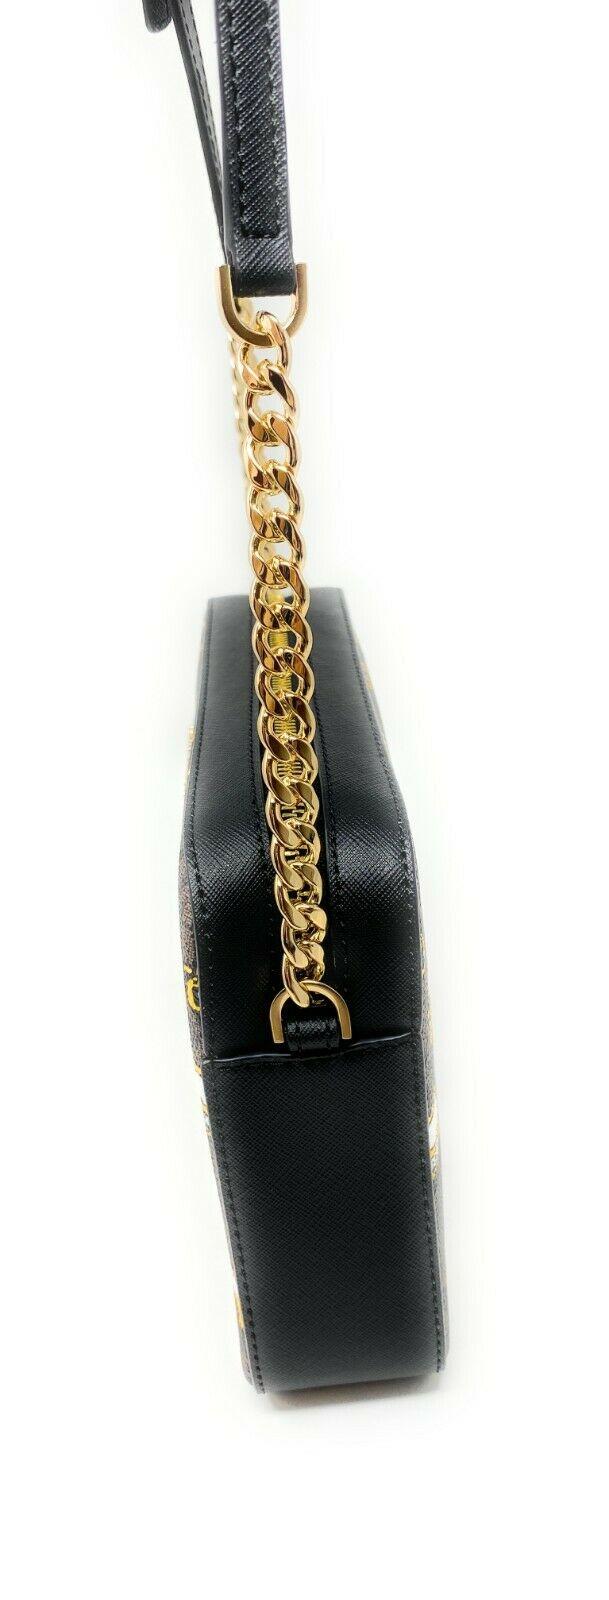 thumbnail 40 - Michael Kors Jet Set Item Large East West Crossbody Chain Handbag Clutch $298